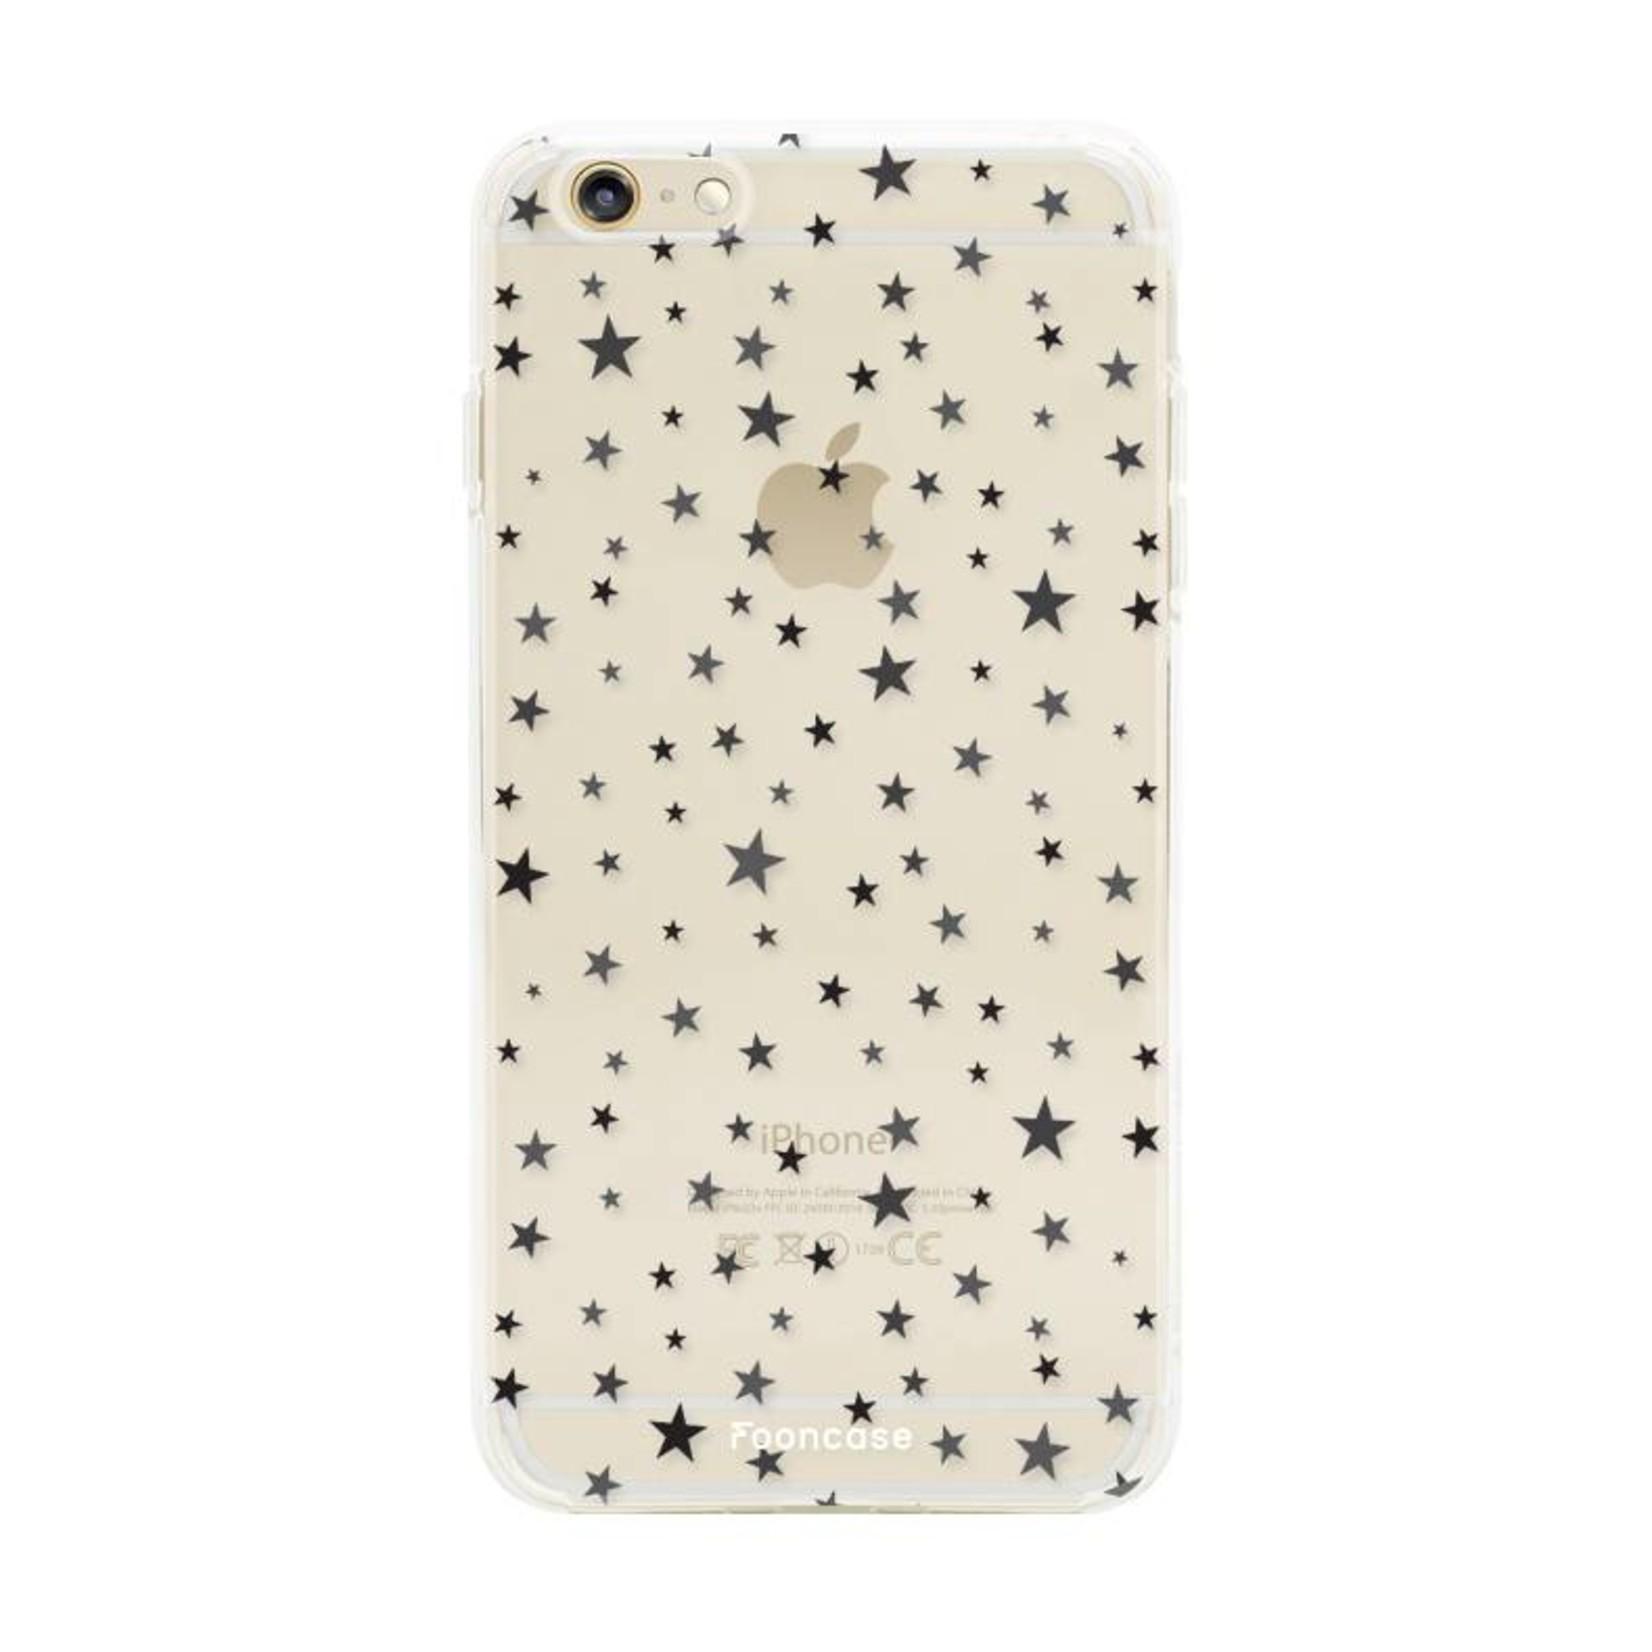 FOONCASE iPhone 6 / 6S hoesje TPU Soft Case - Back Cover - Stars / Sterretjes